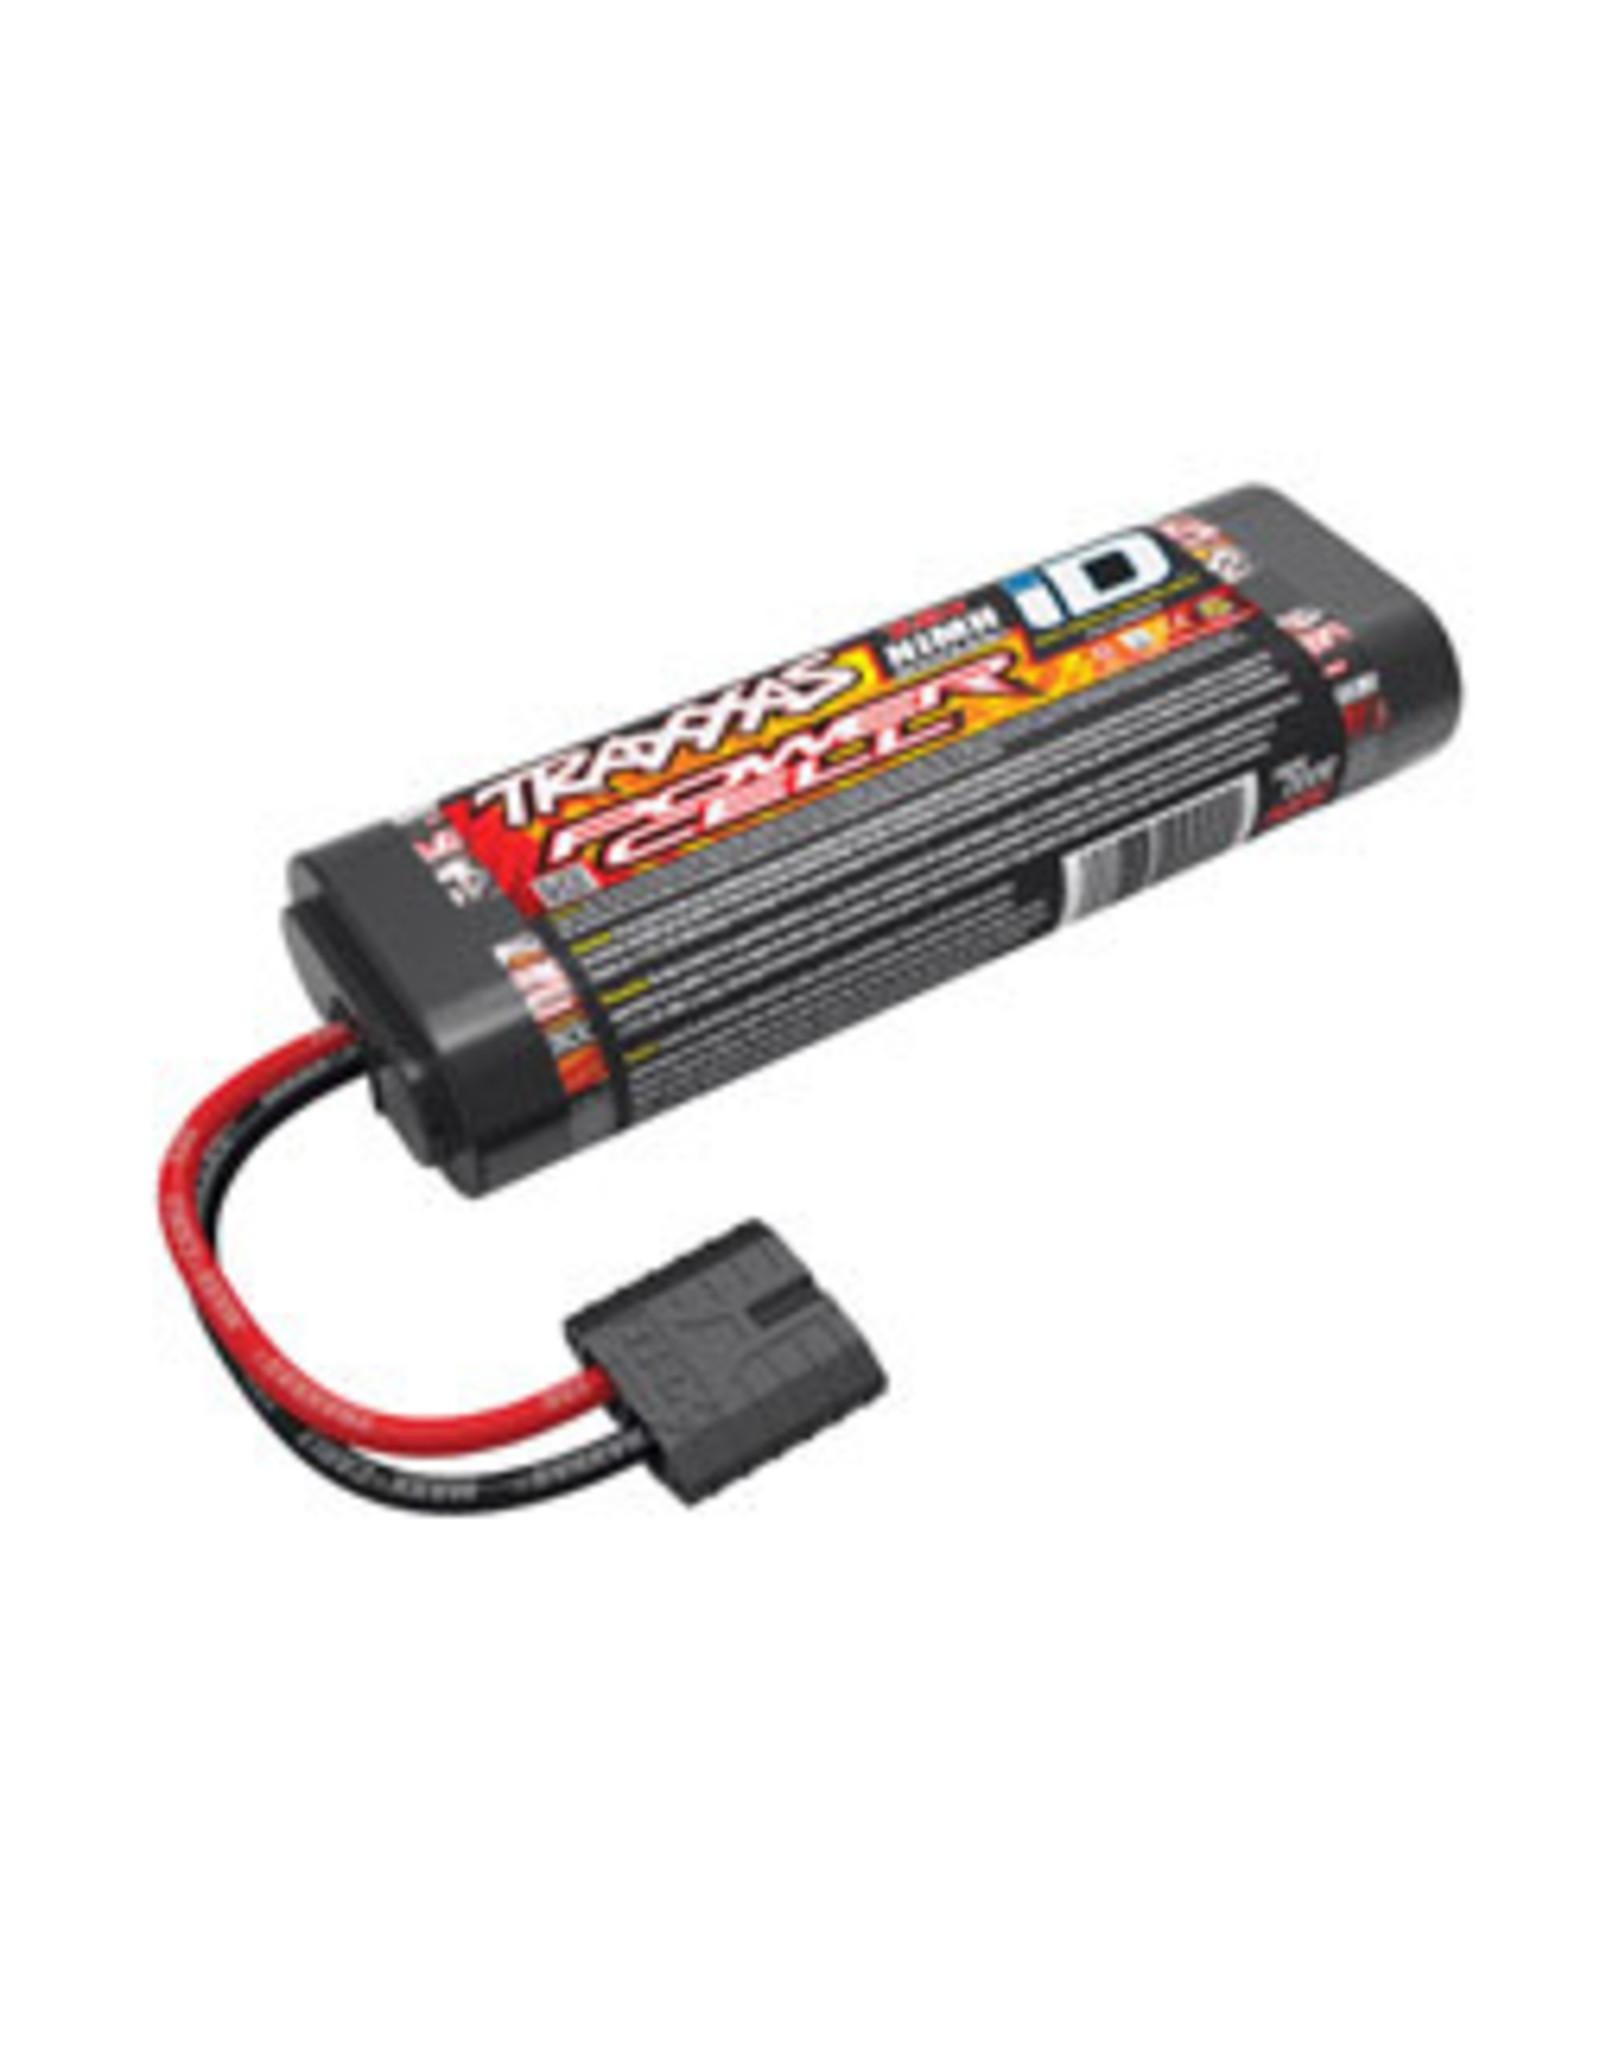 Traxxas Battery, Power Cell, 3000mAh (NiMH, 6-C flat, 7.2V)